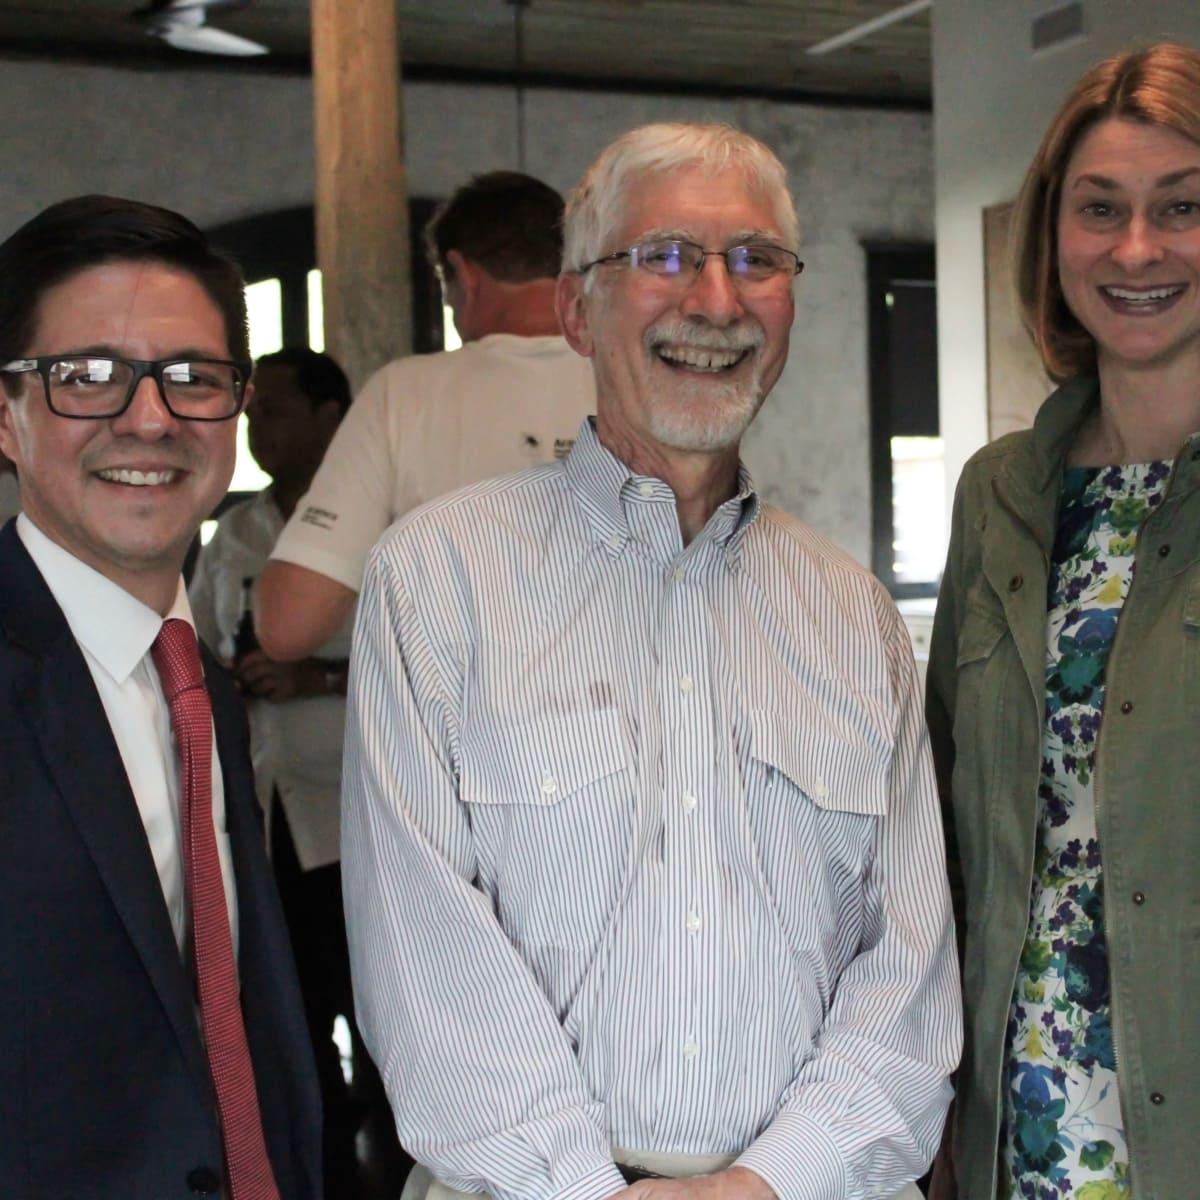 Houston Parks Board event, 7/16, Nick Espinosa, John Long, Leigh McBurnett